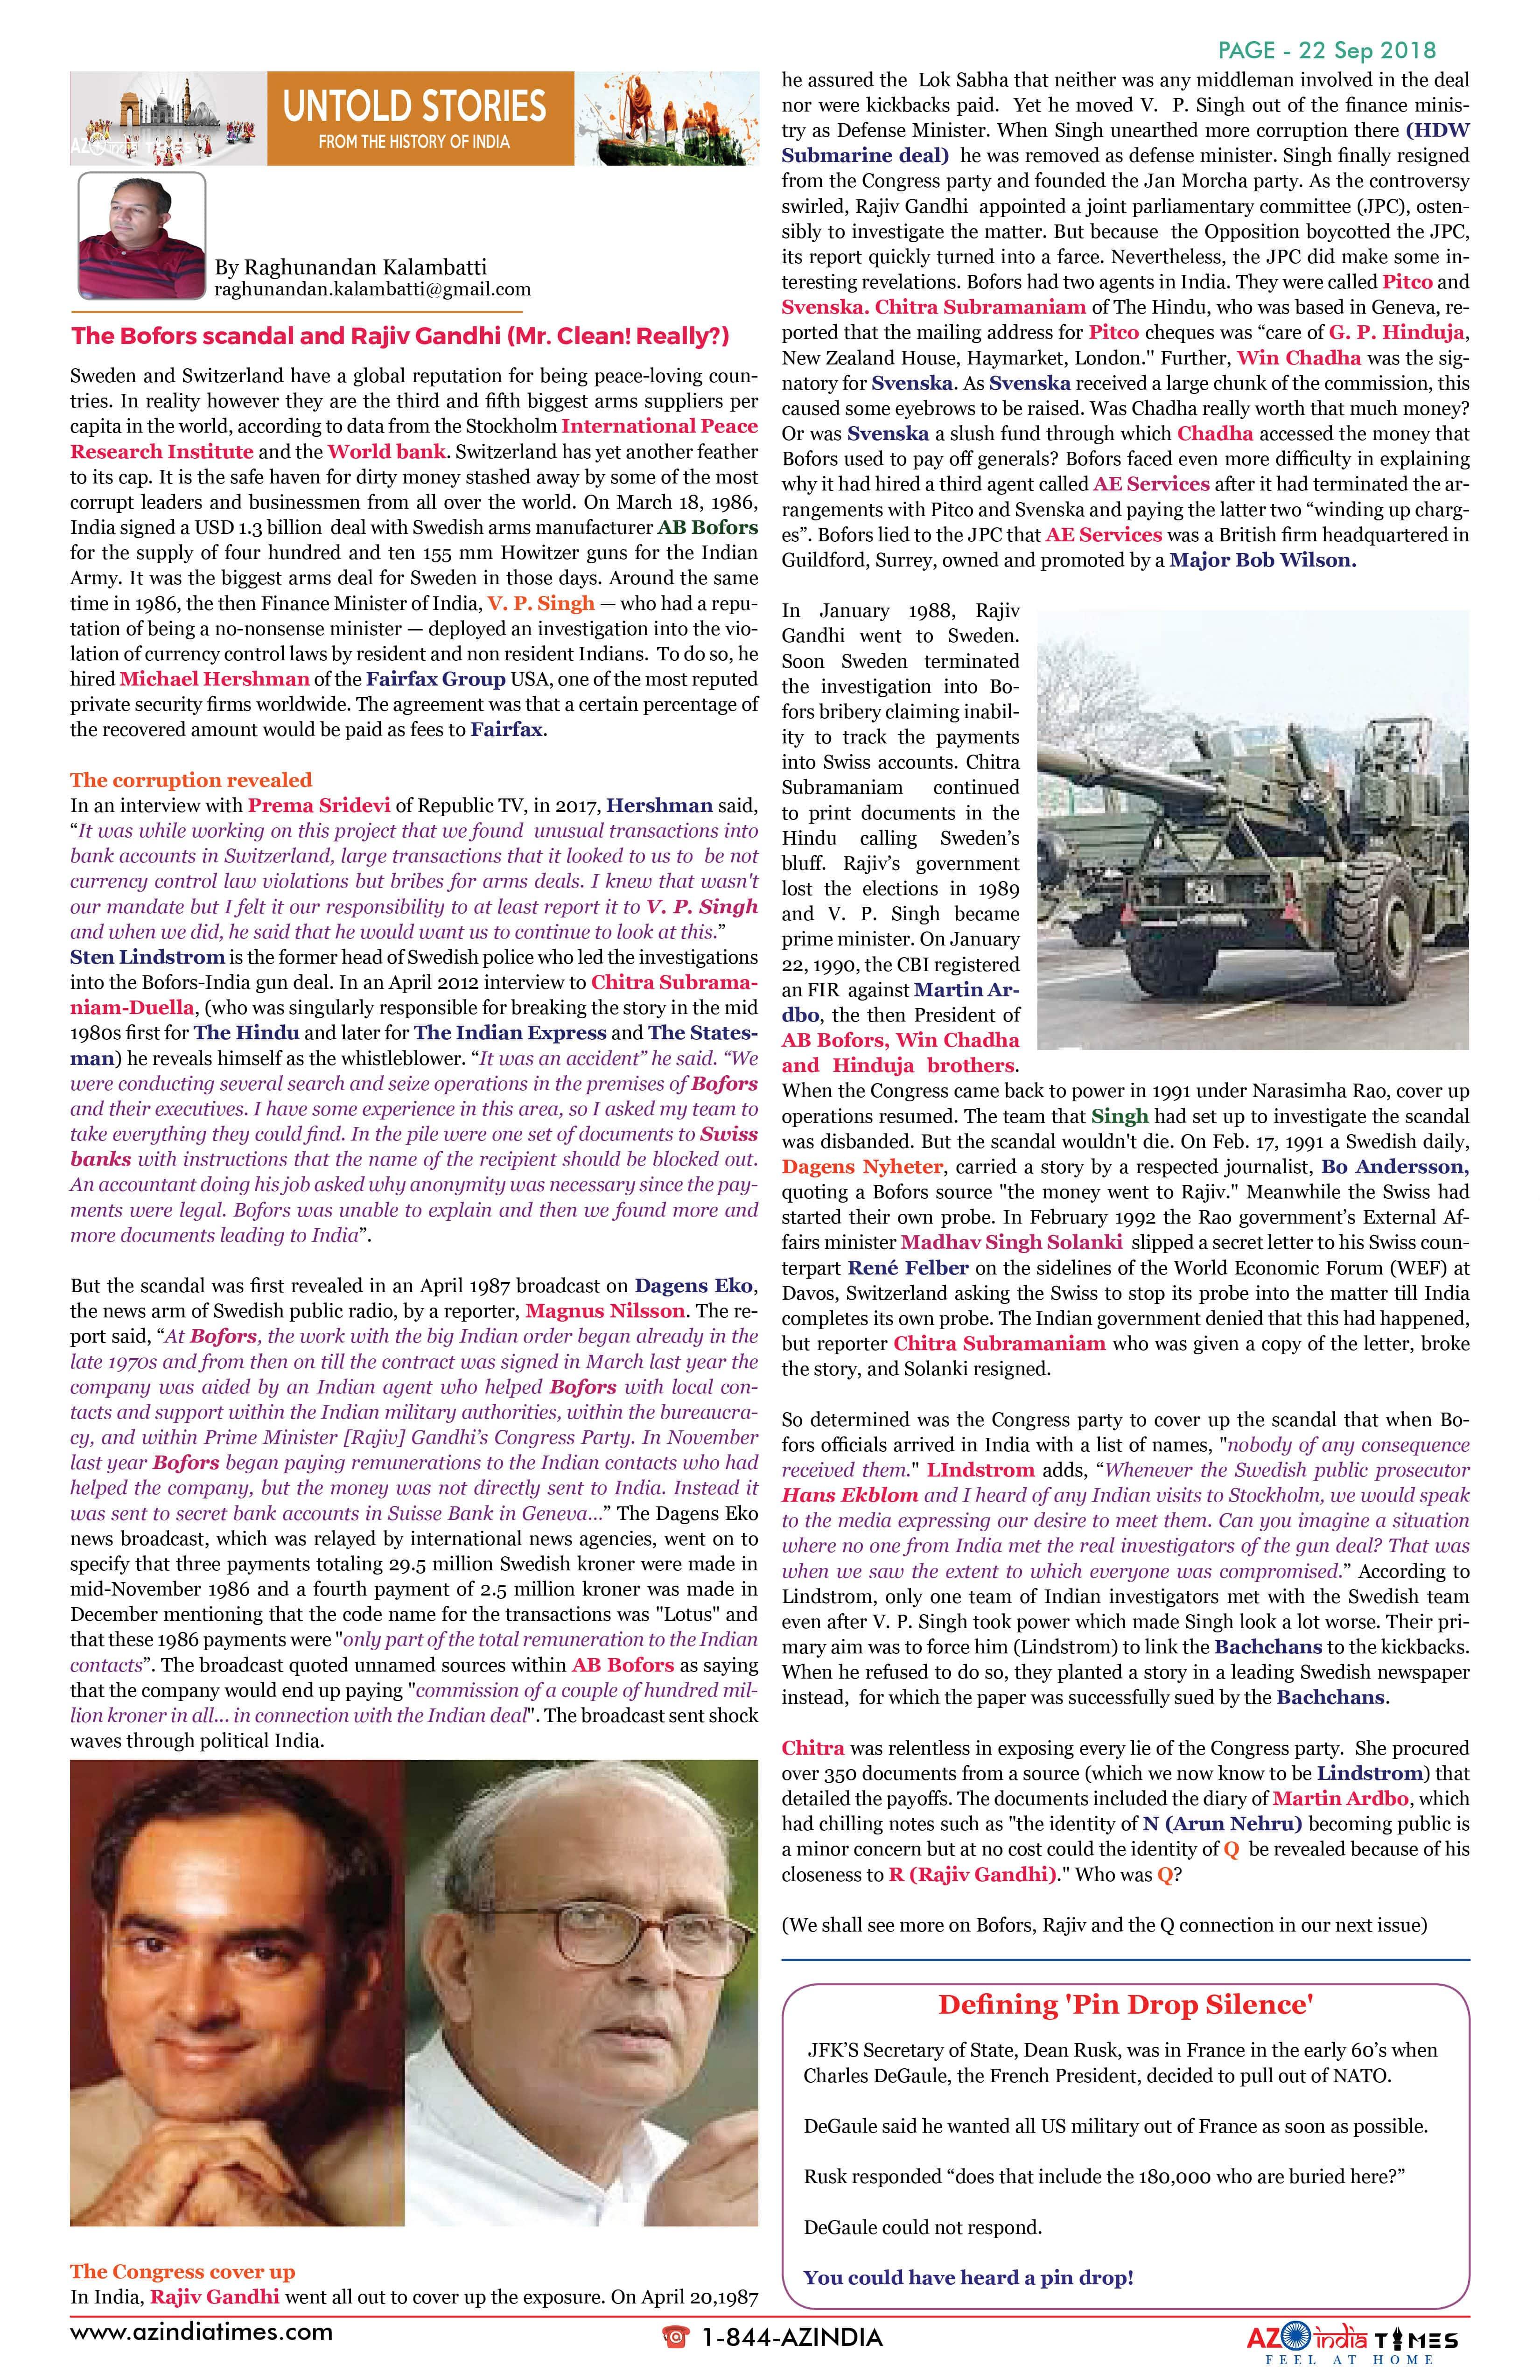 AZ INDIA SEPTEMBER  EDITION 22